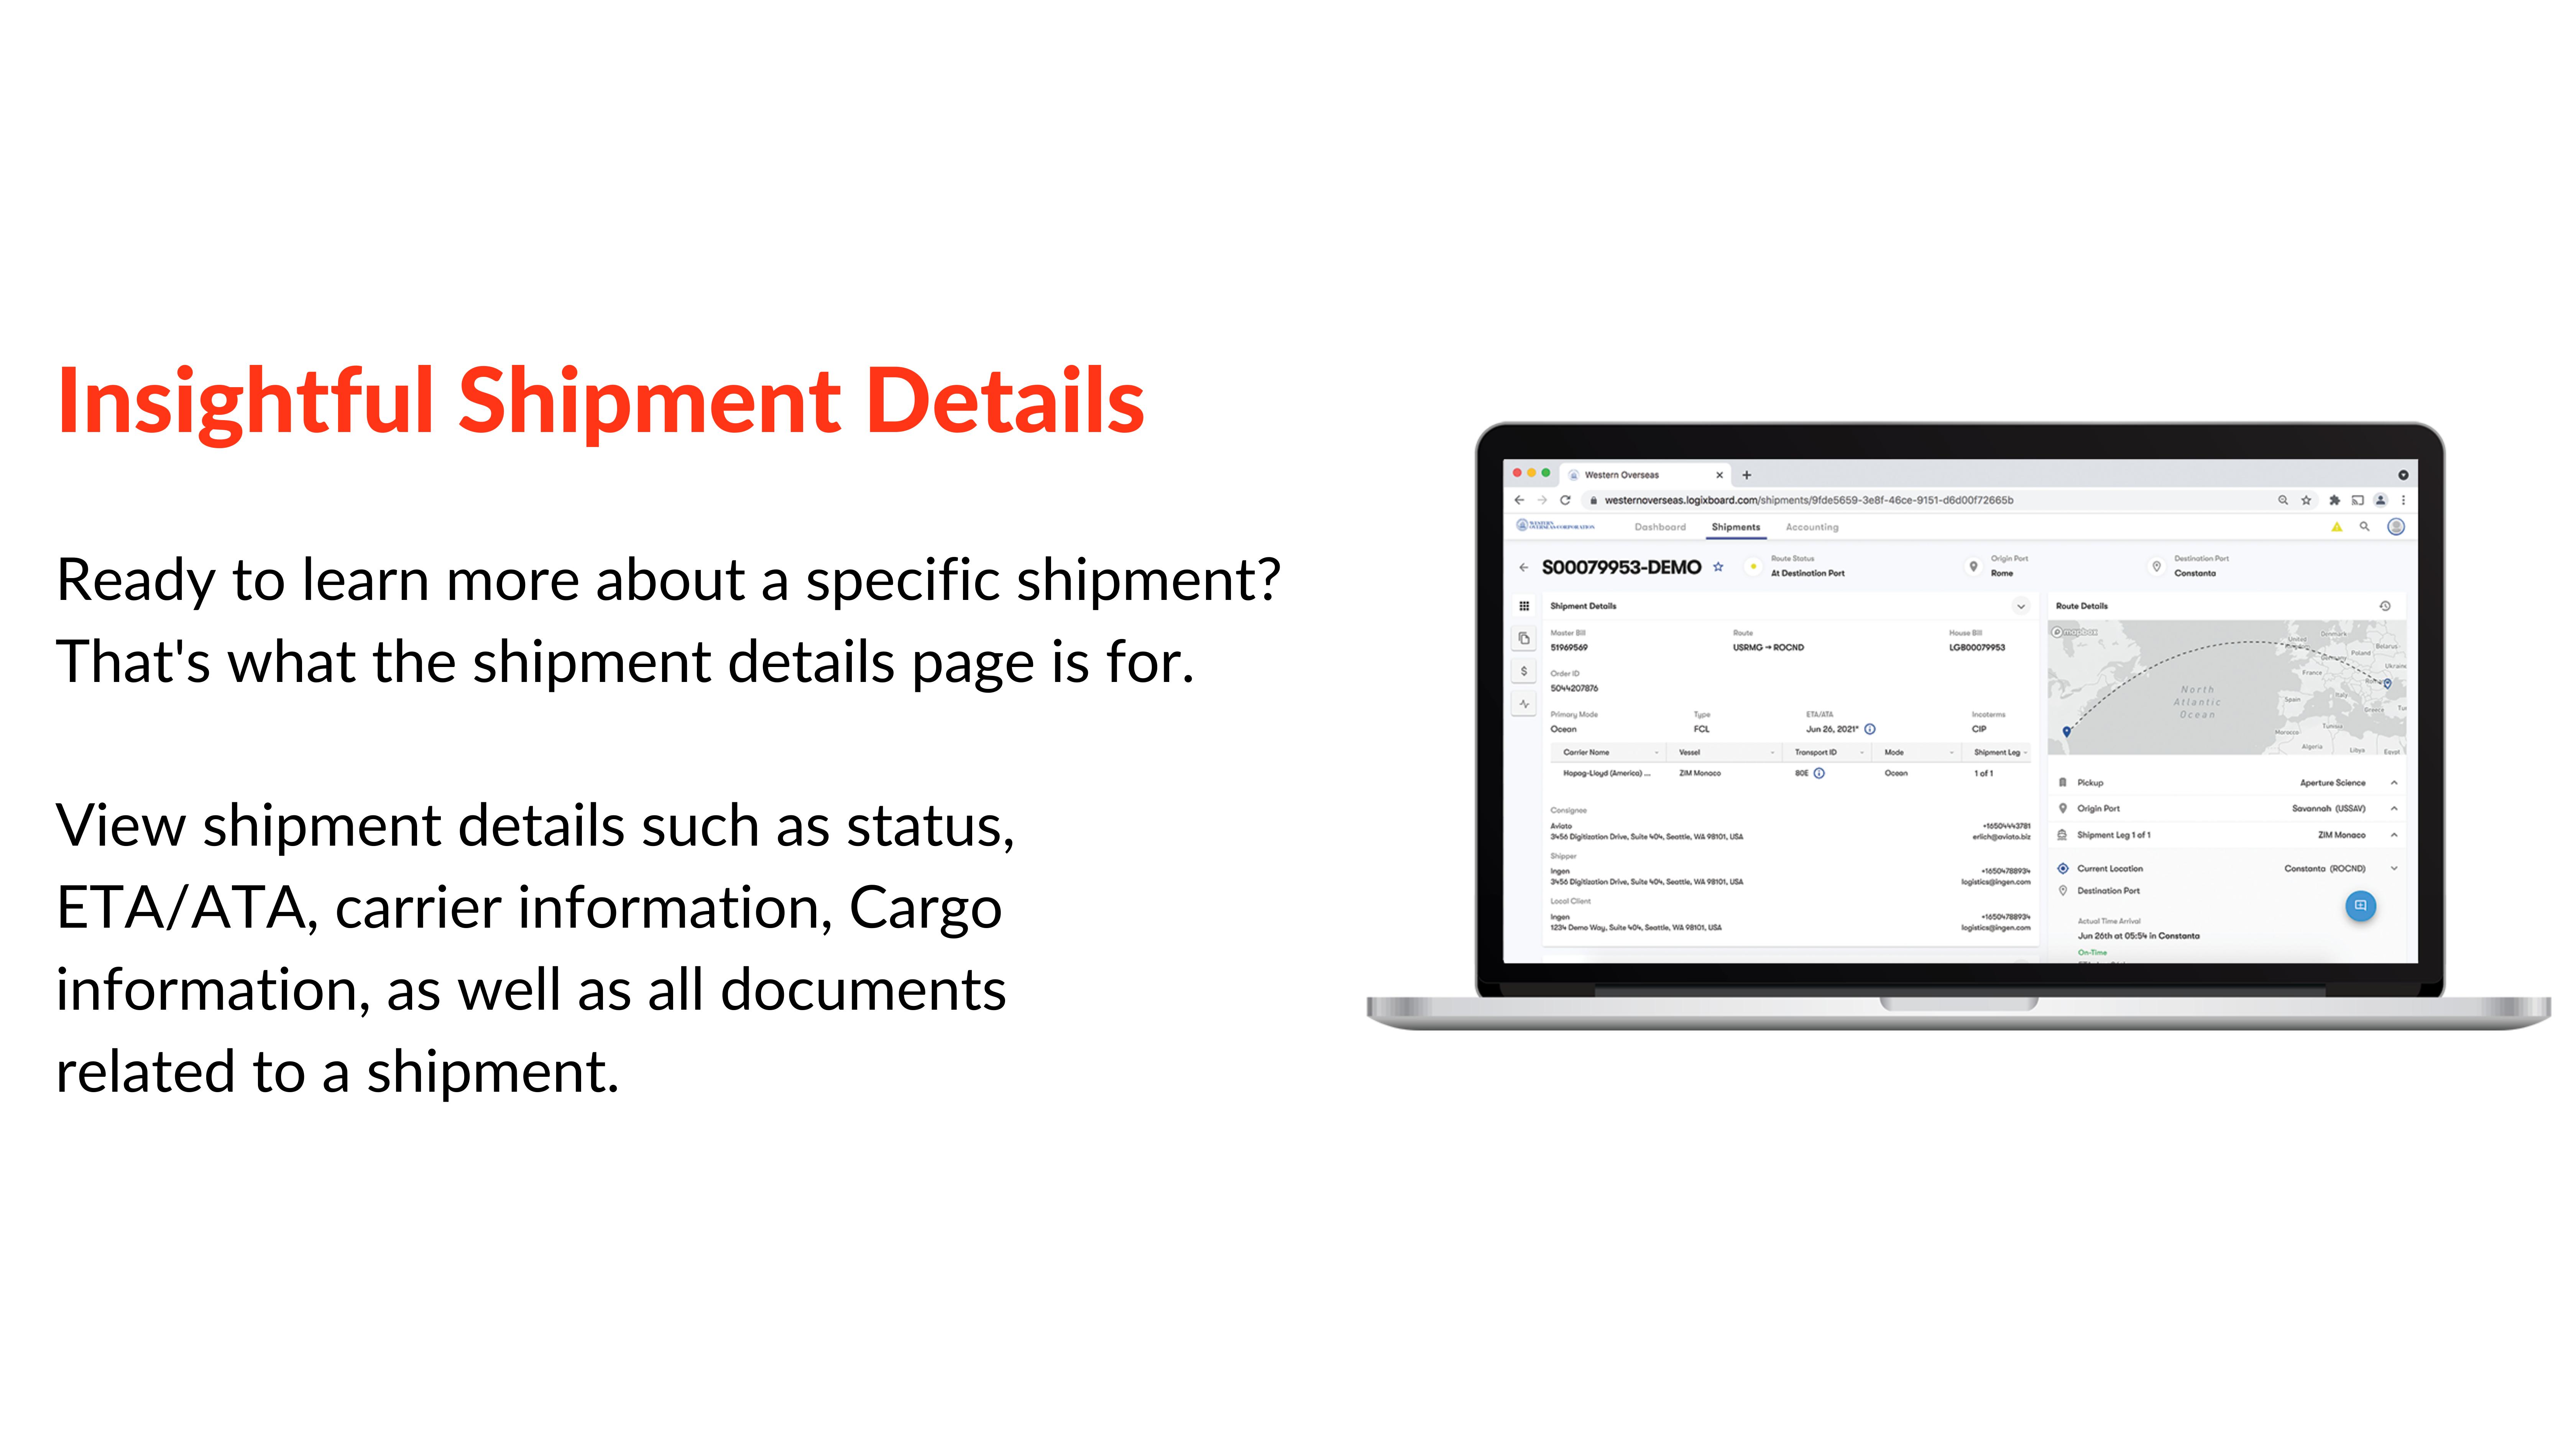 insightful shipment details